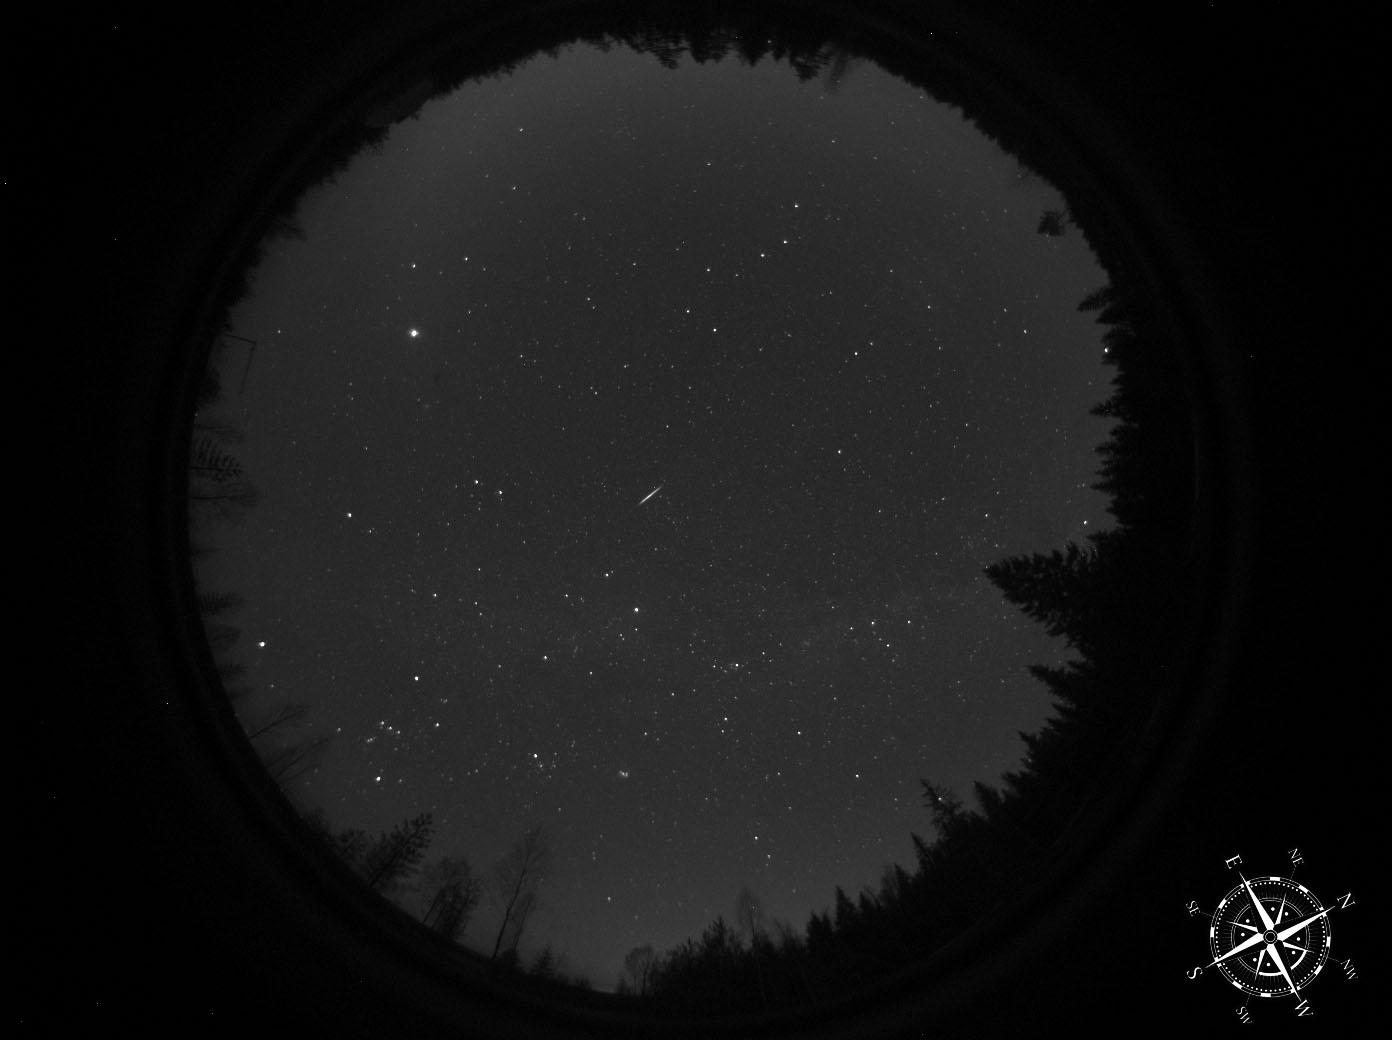 Orionidi - 23.10.2014 kello 05:47